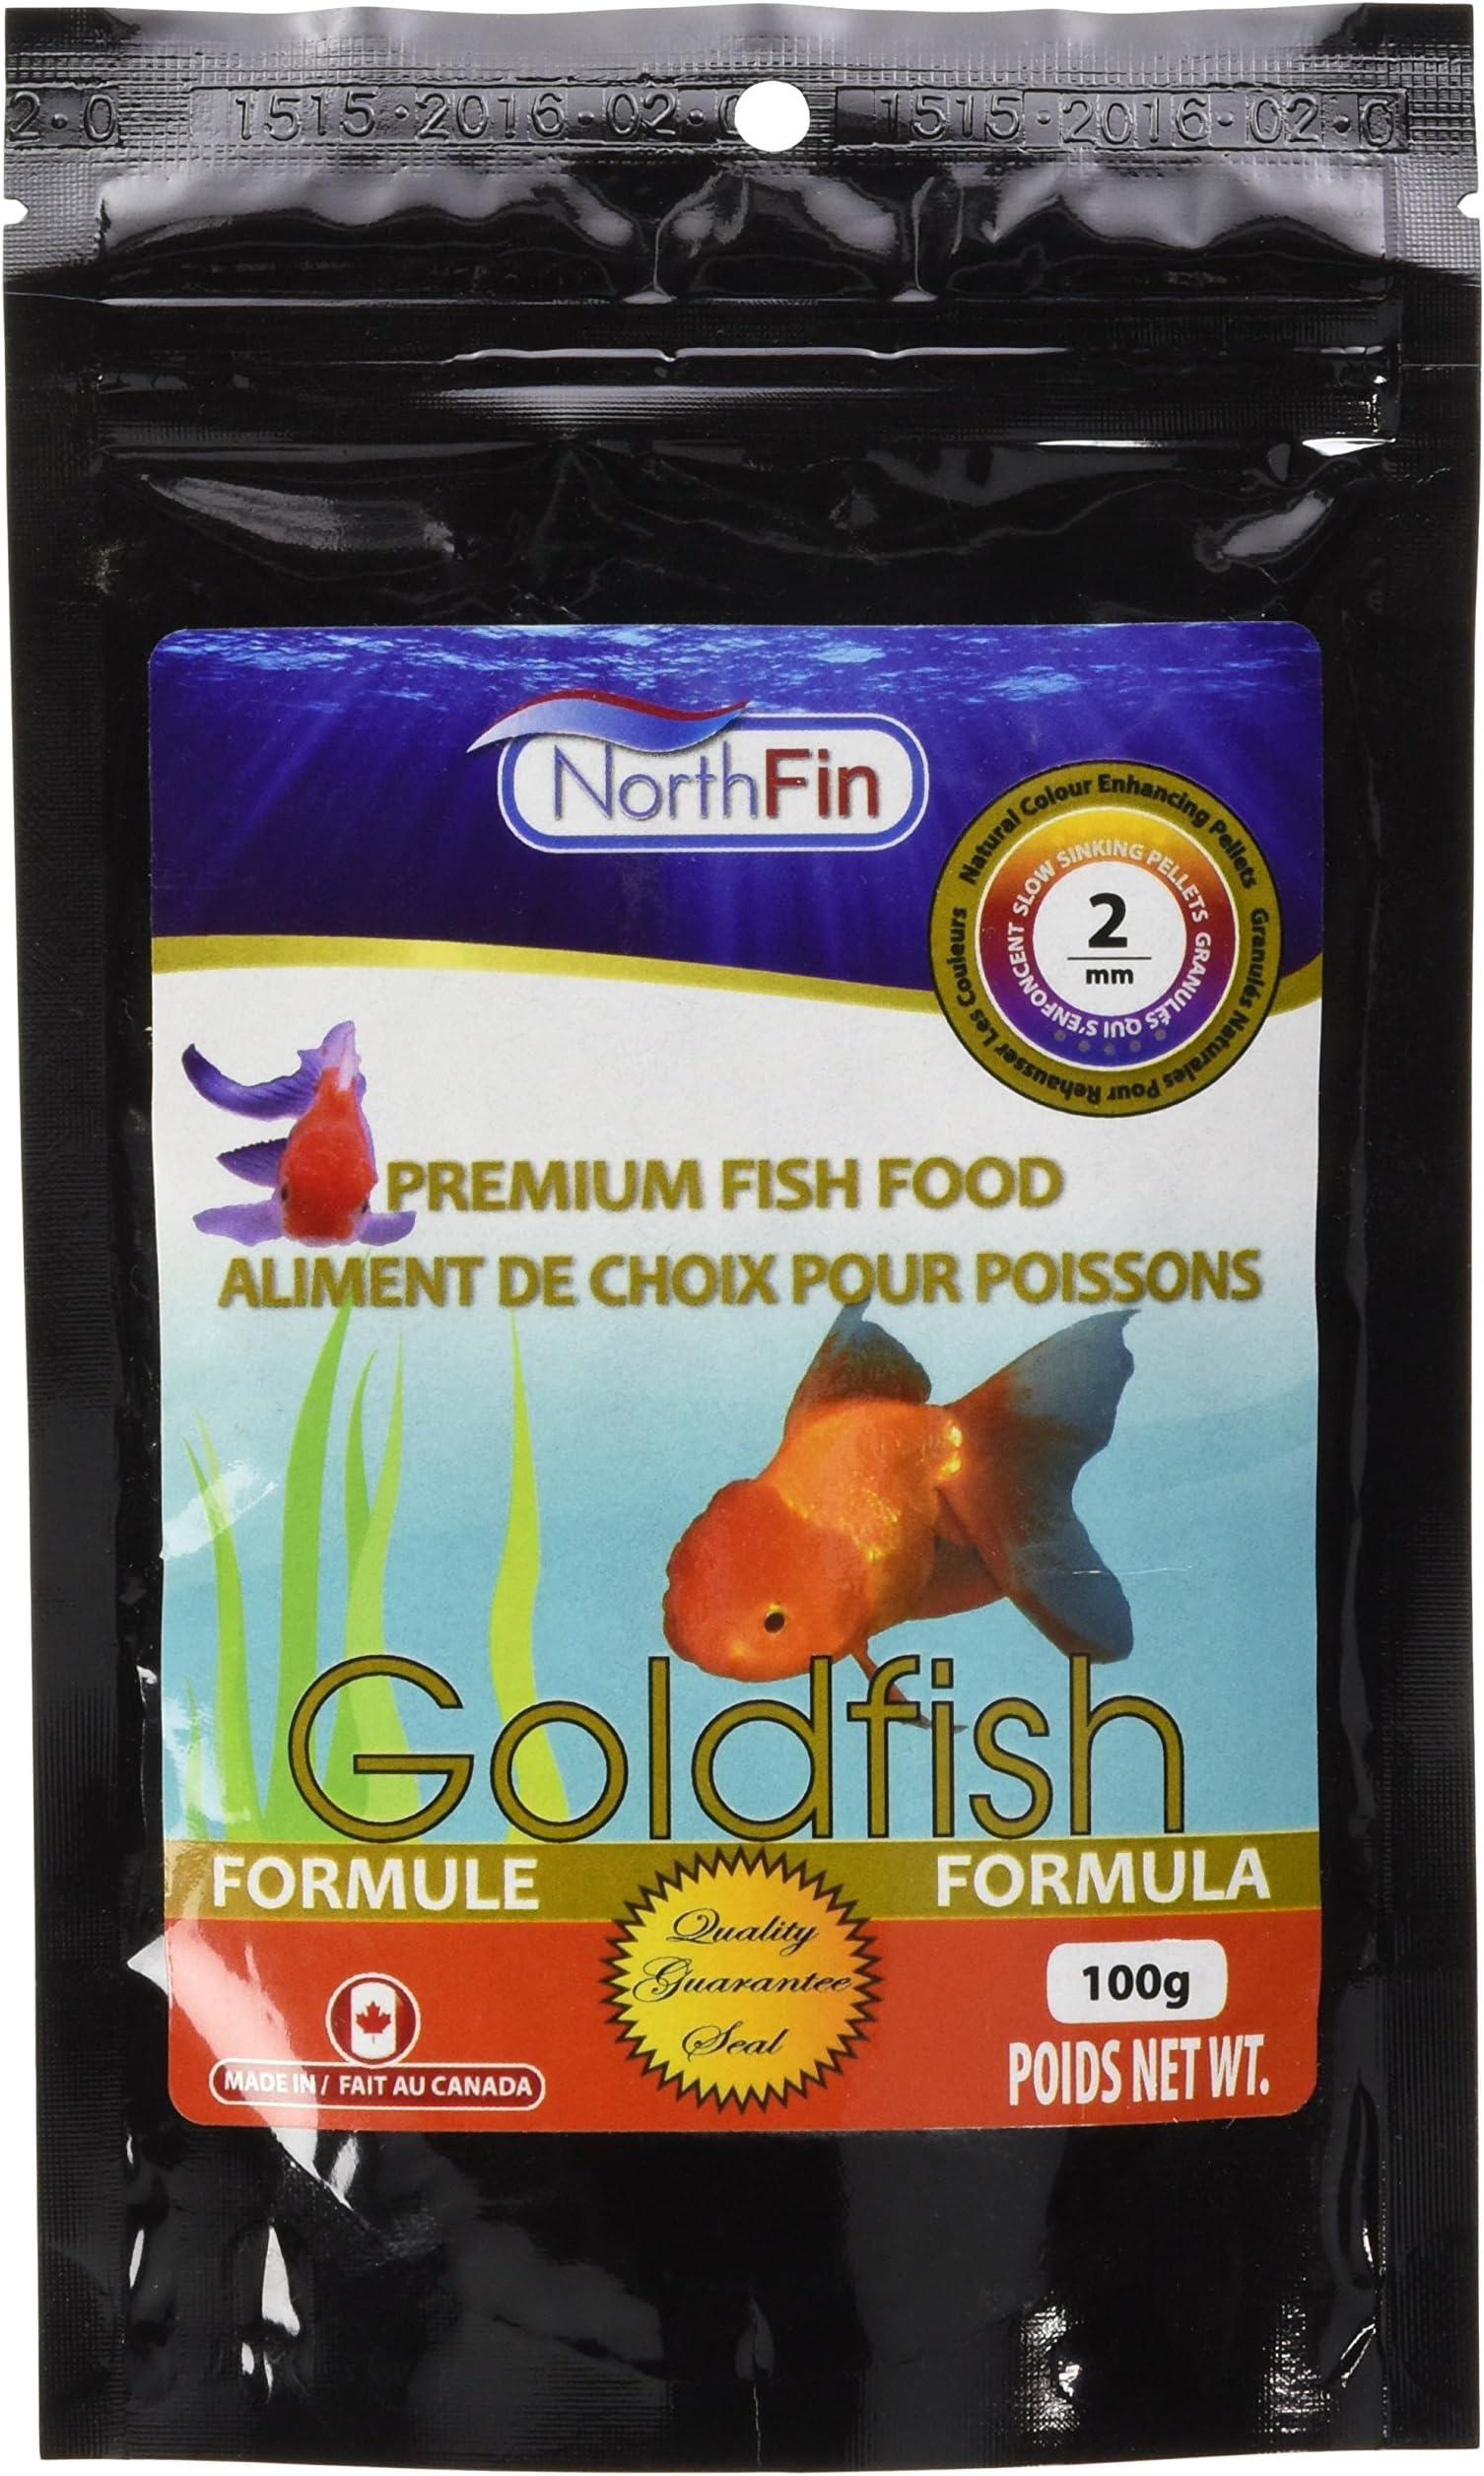 Northfin Food Goldfish Formula 2mm Pellet 100 Gram Package